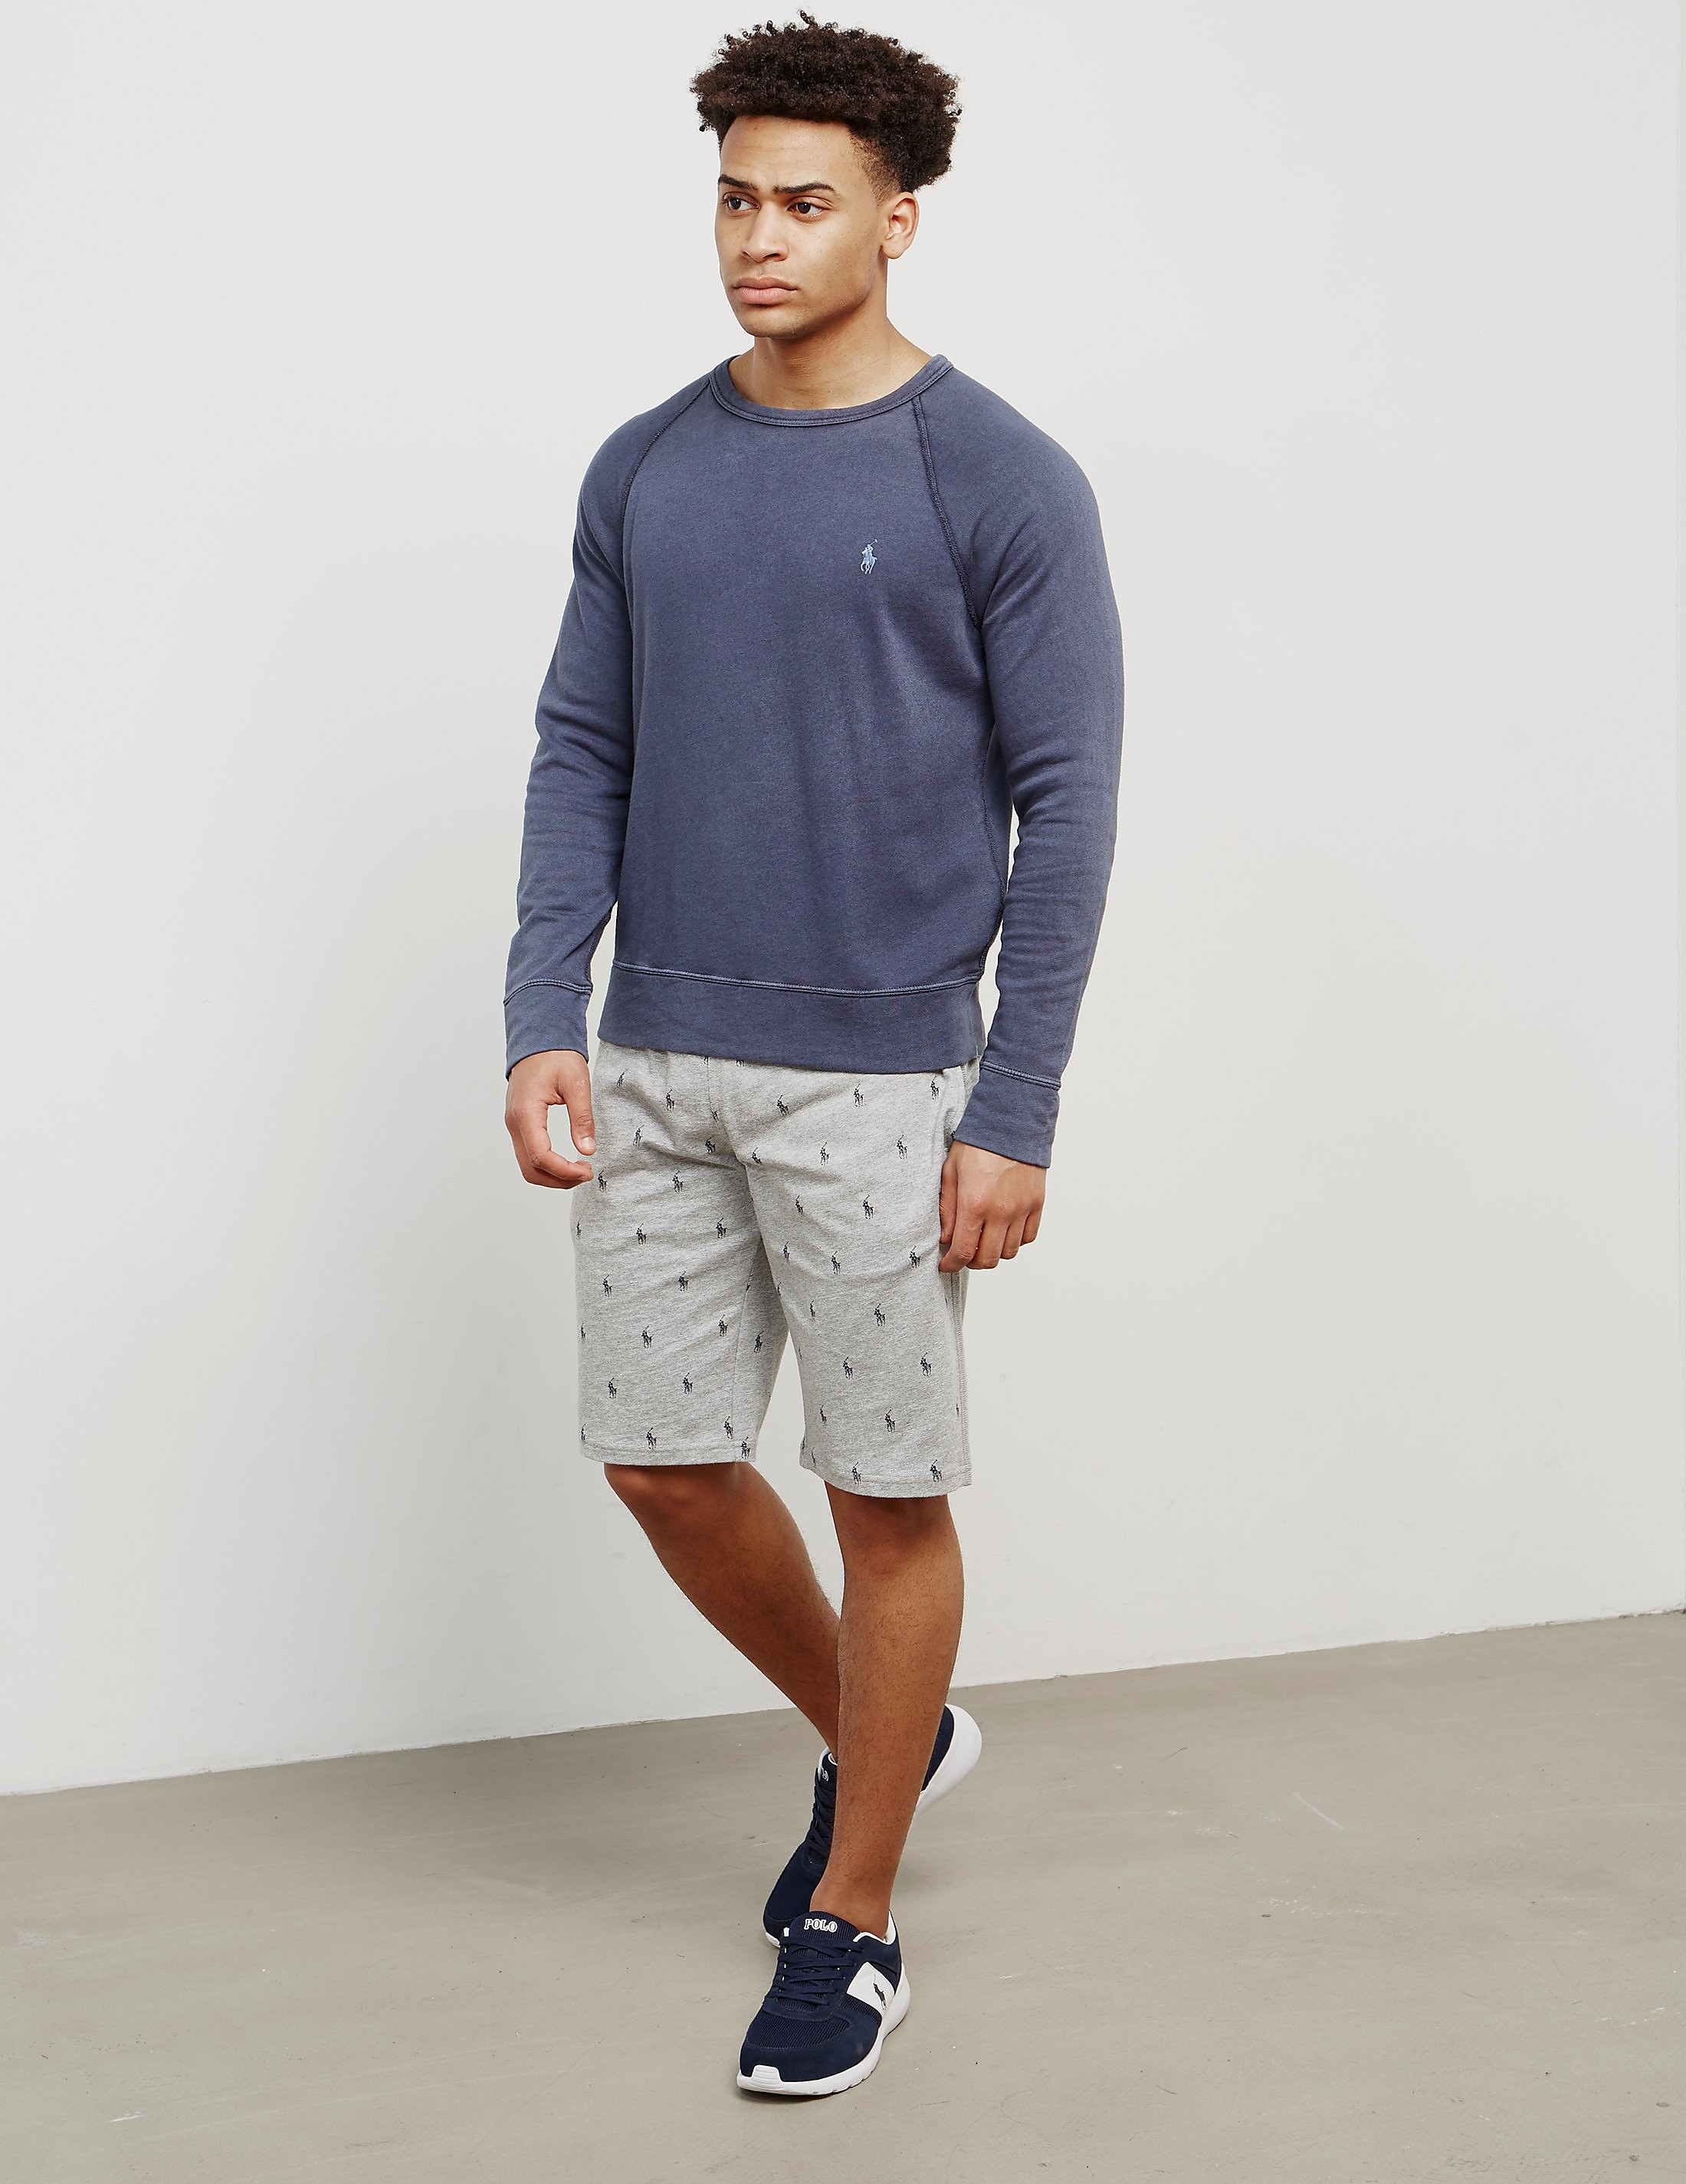 Polo Ralph Lauren Terry Knitted Sweatshirt